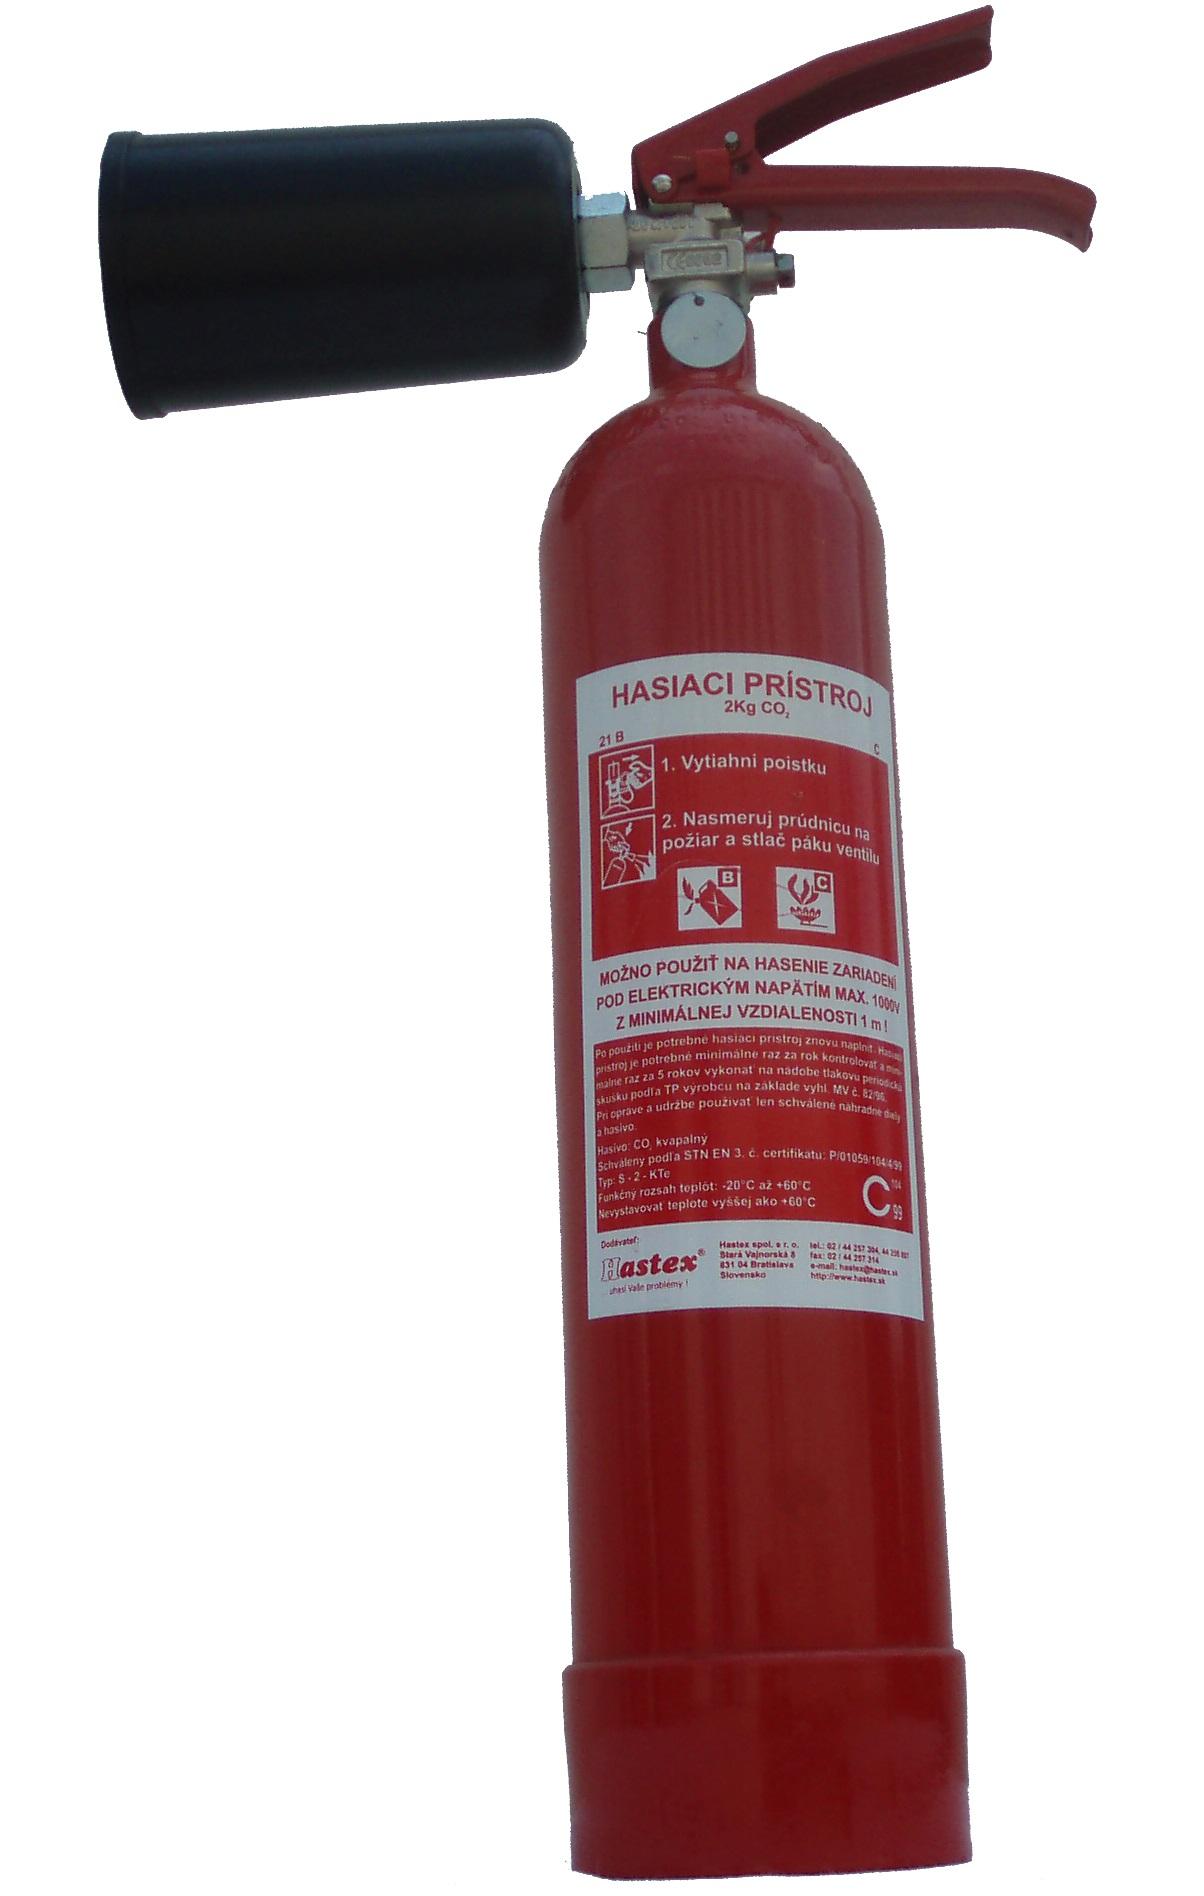 hasiaci-pristroj-co2-snehovy-2-kg